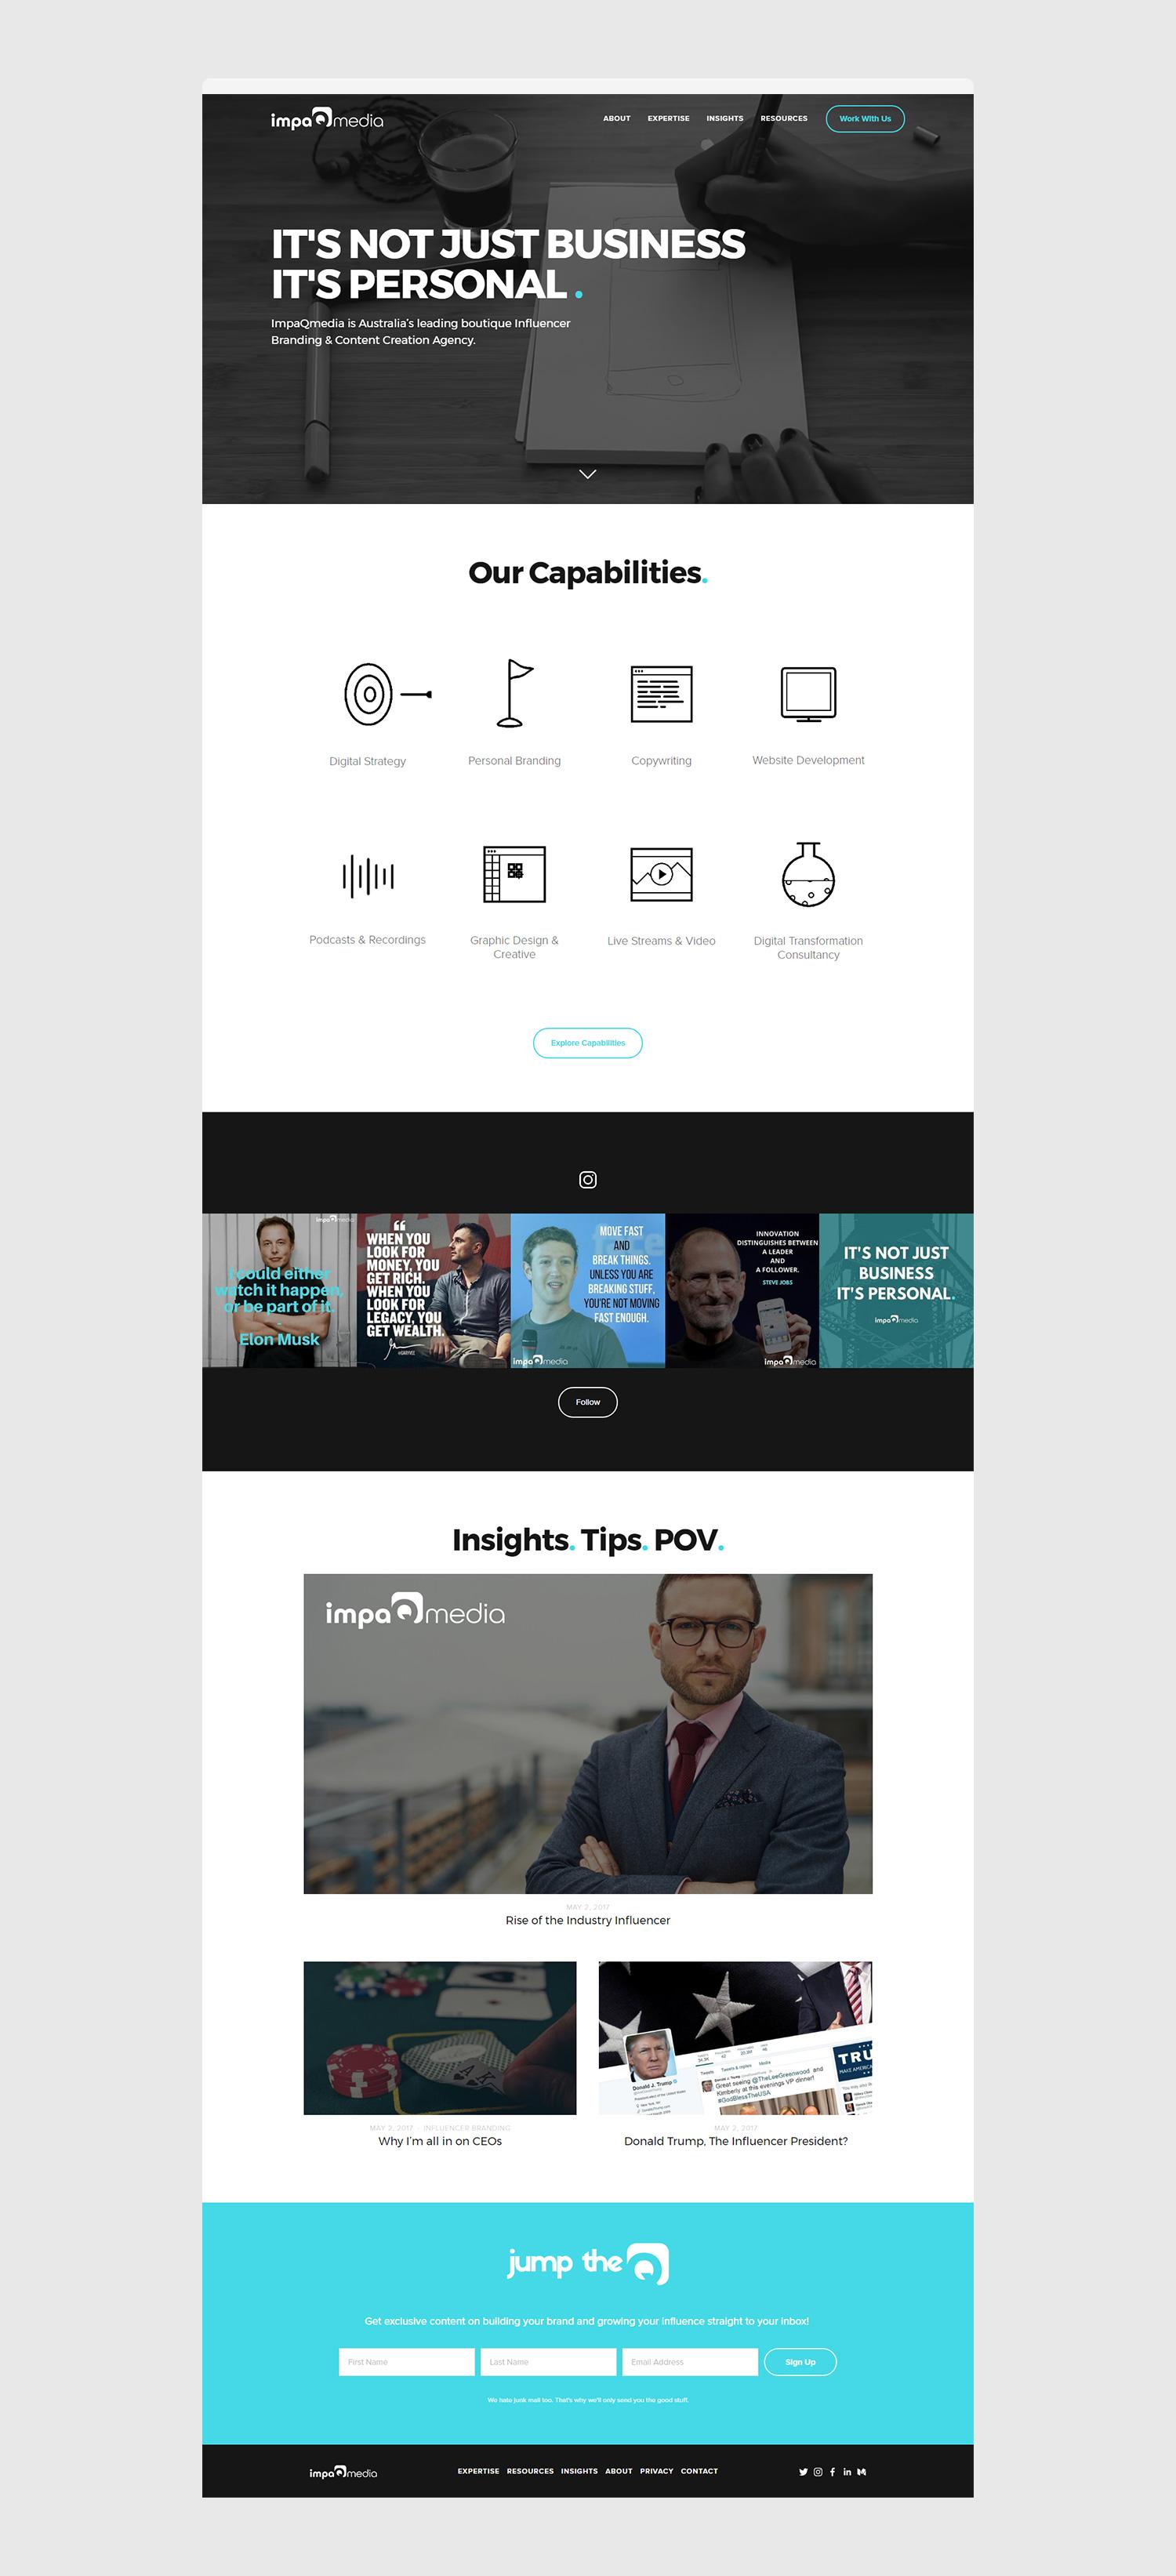 squarespace-content-creation-agency-portfolio-1.jpg